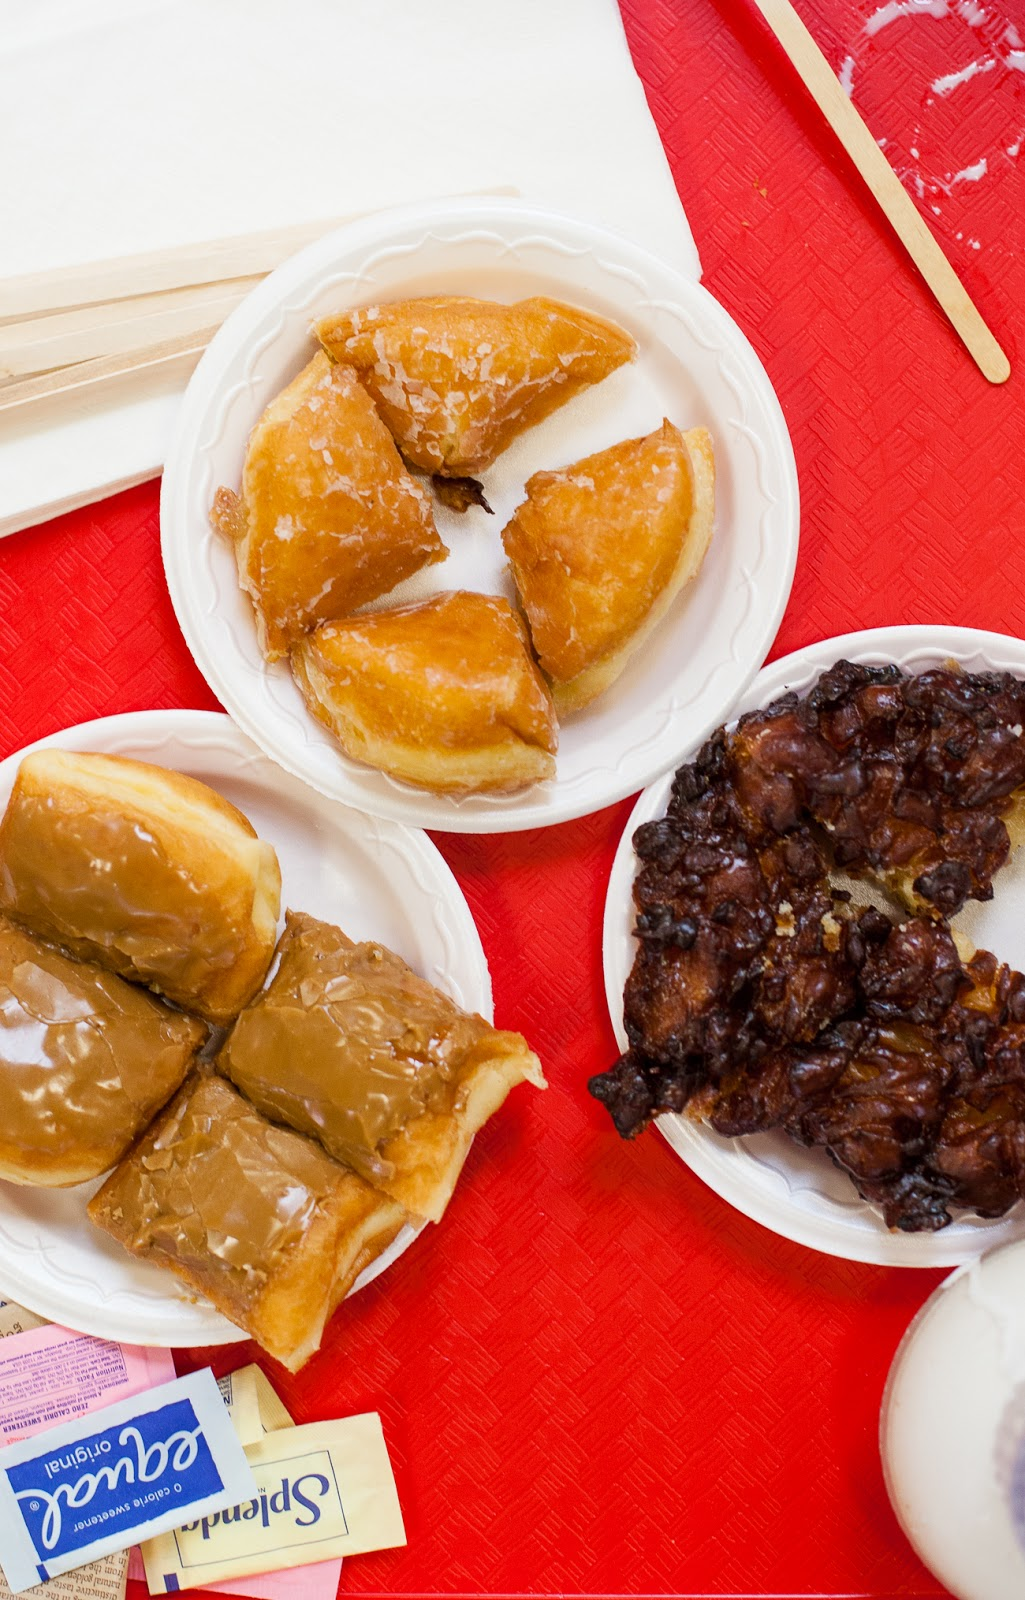 Bob's Donut • LA Farmers Market / blog.jchongstudio.com